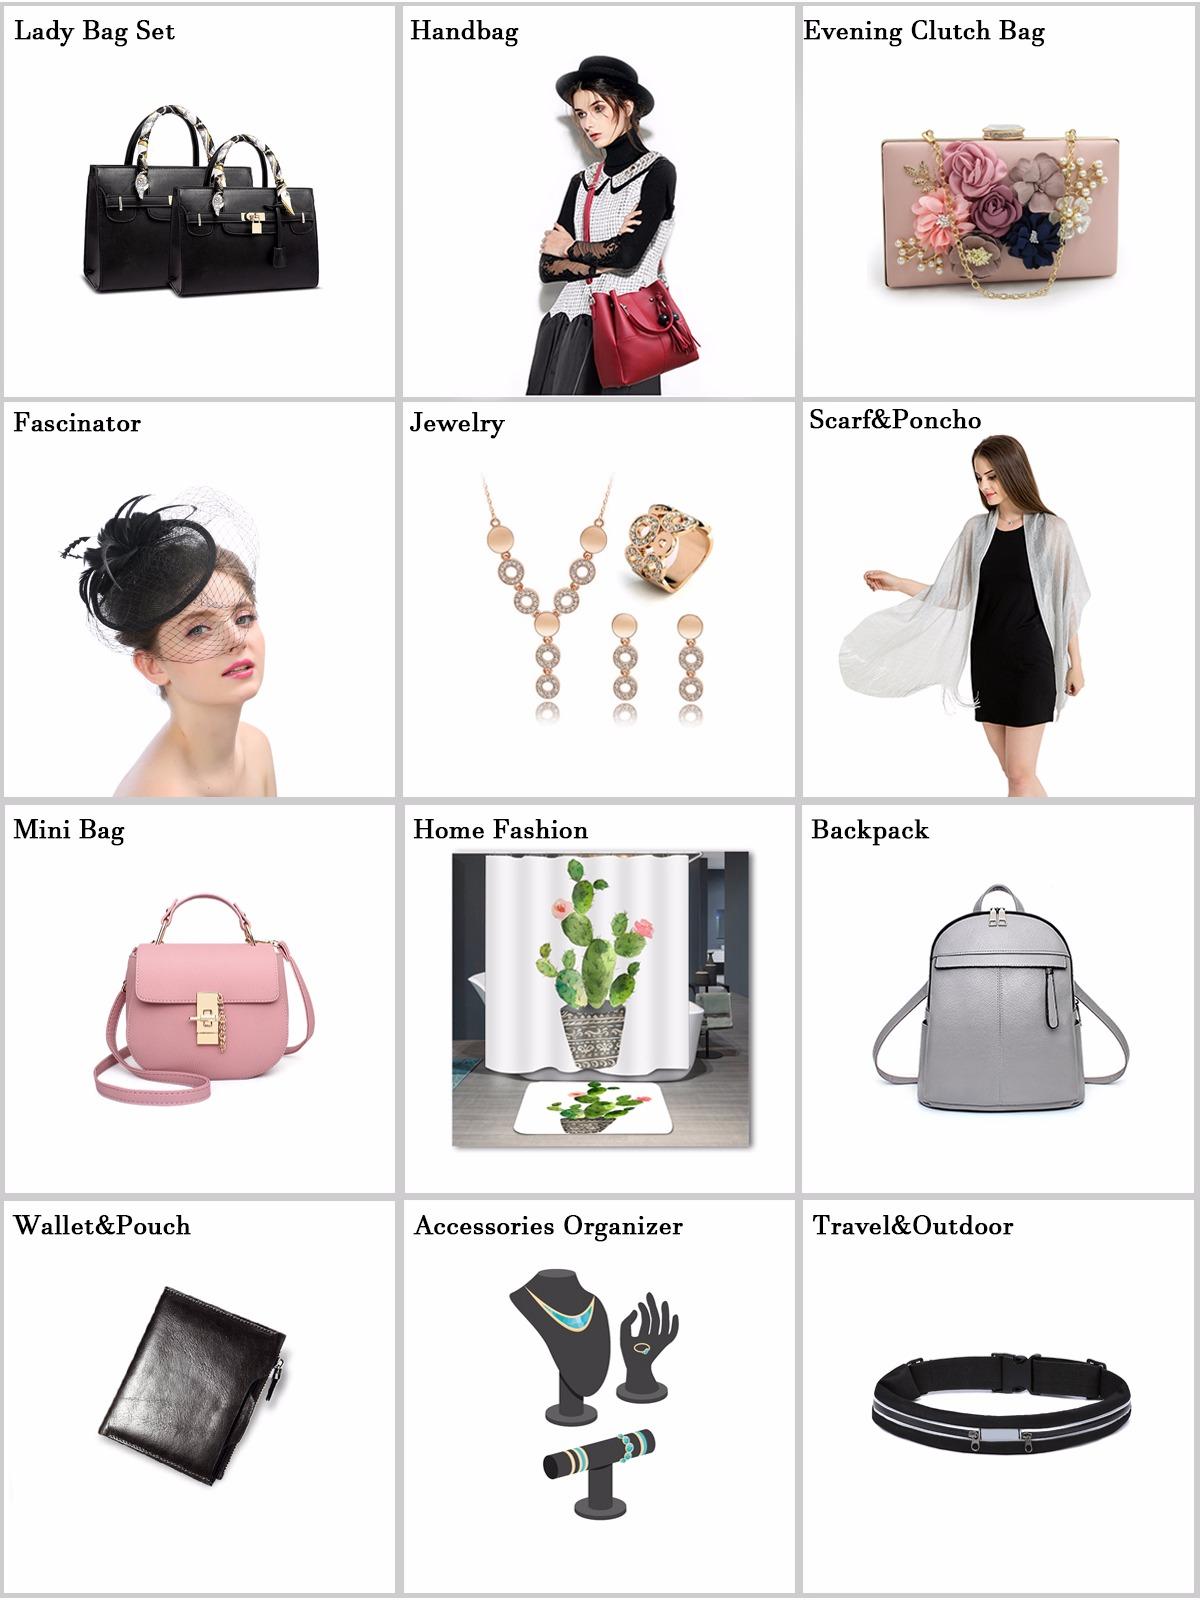 Yiwu Creatronics Imp Exp Co Ltd Purse Handbag Celana Pendek Motif Tartan Blx510 Product Showcase